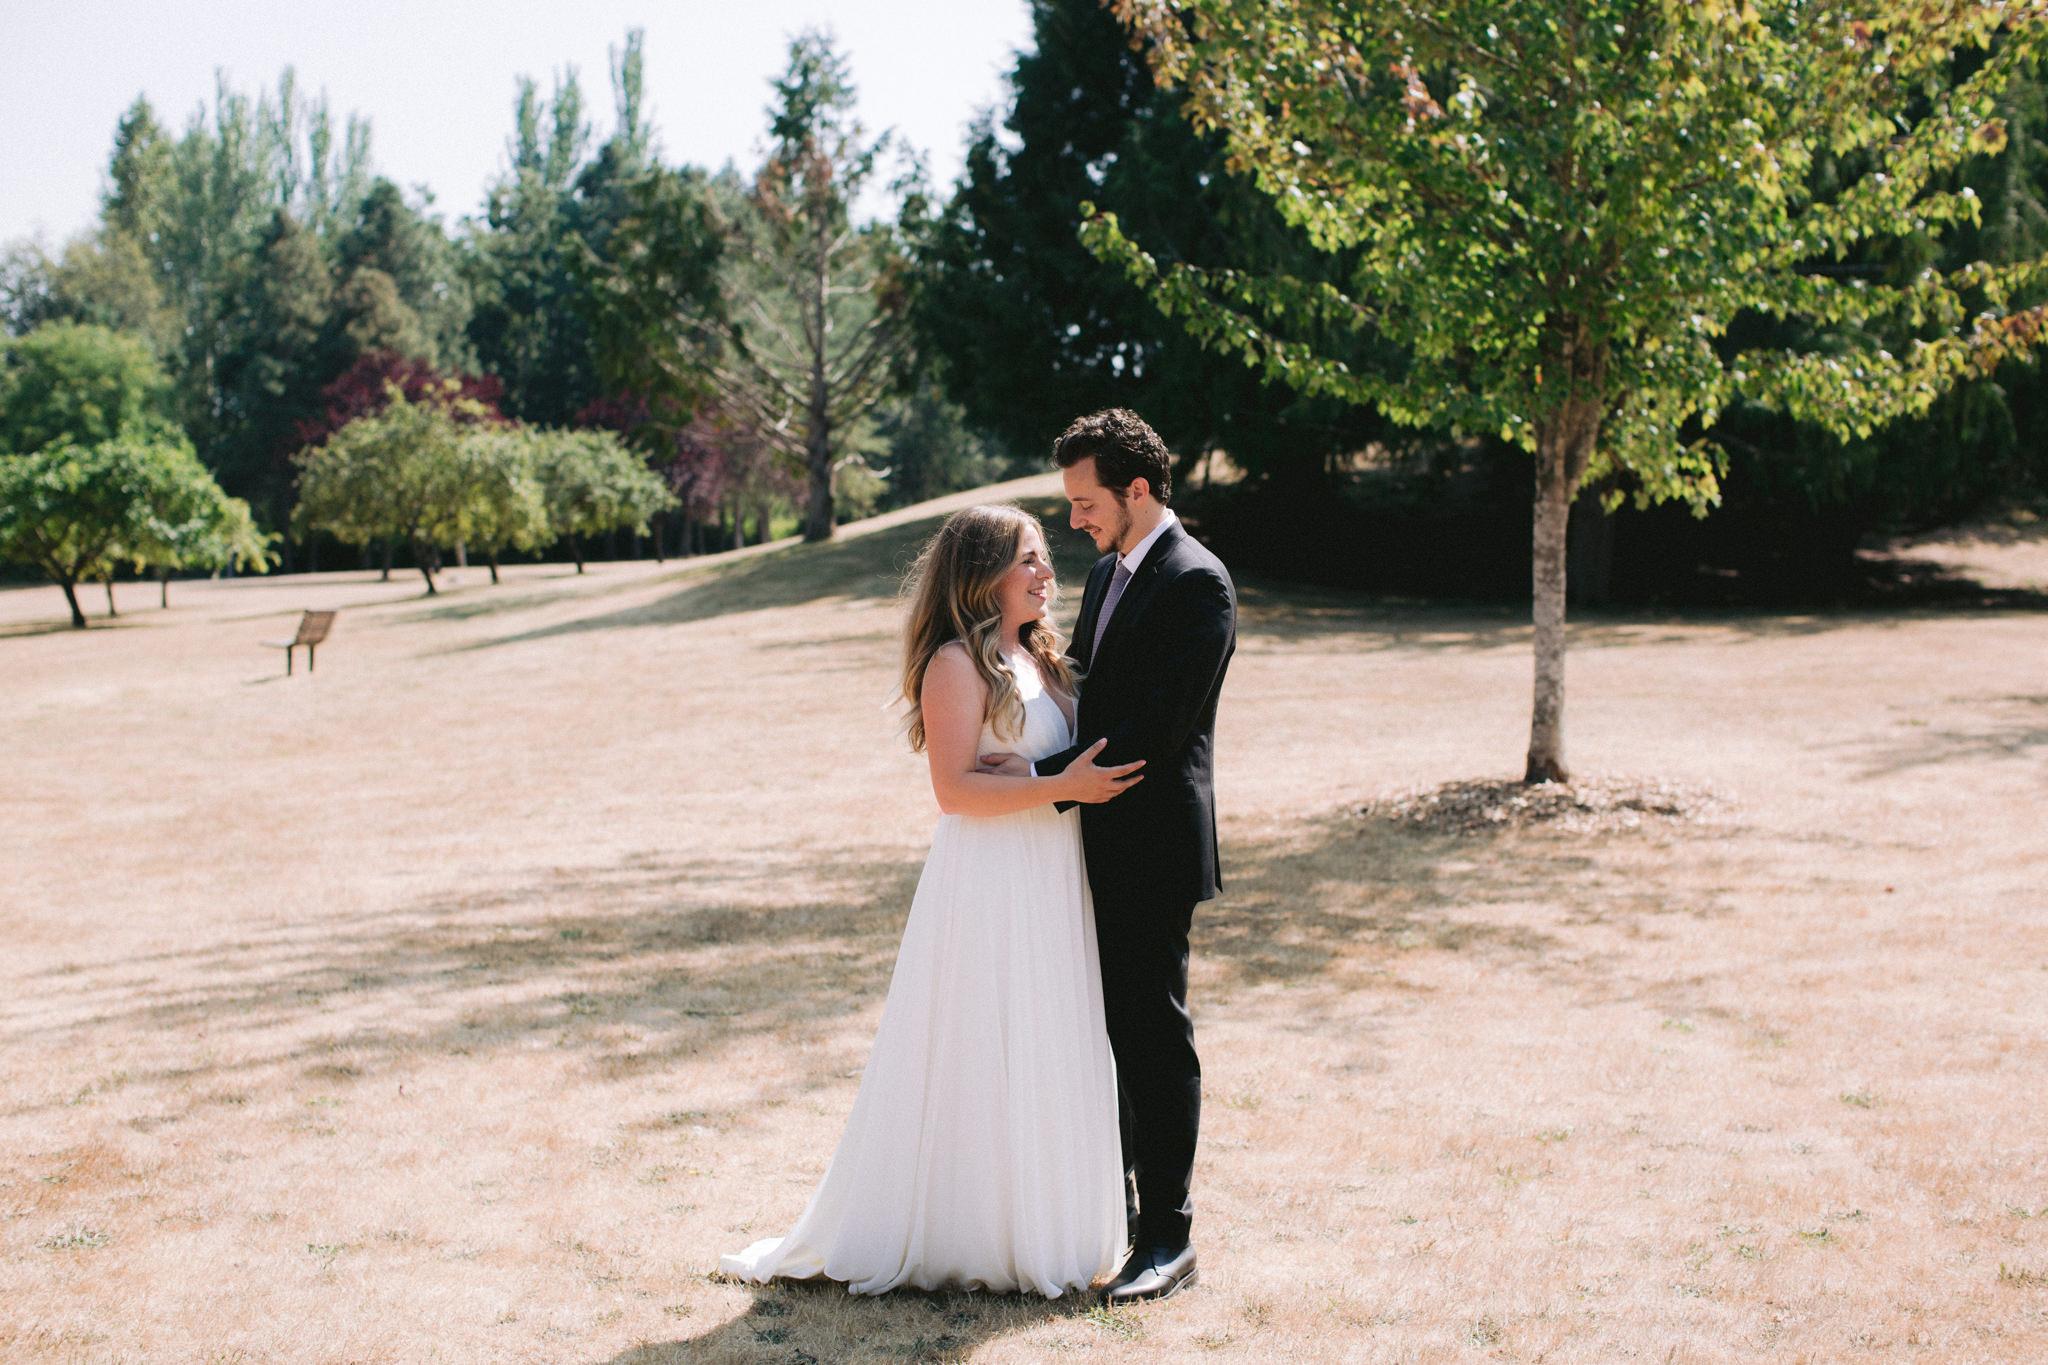 Backyard-Bainbridge-Island-Wedding-Alycia-Lovell-Photography-45.JPG